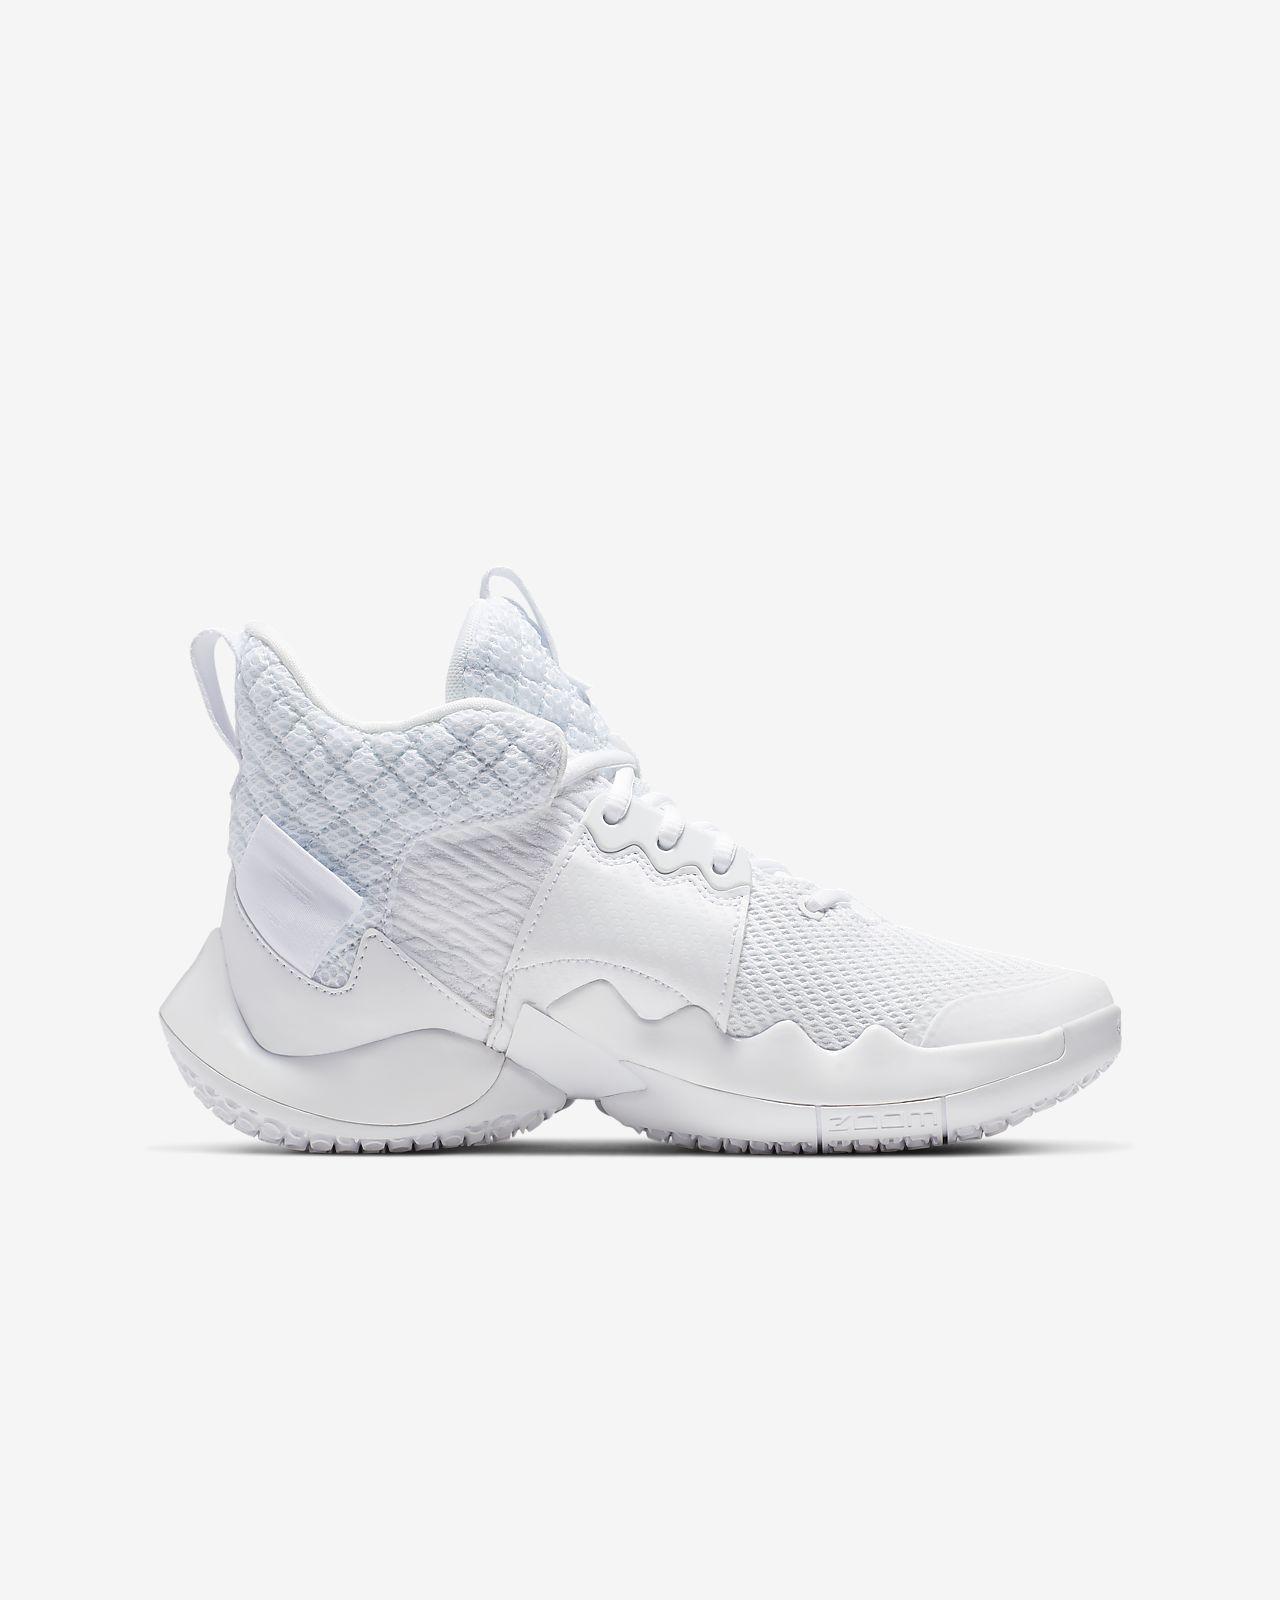 e7c62fa97 Jordan 'Why Not?' Zer0.2 Older Kids' Basketball Shoe. Nike.com CA